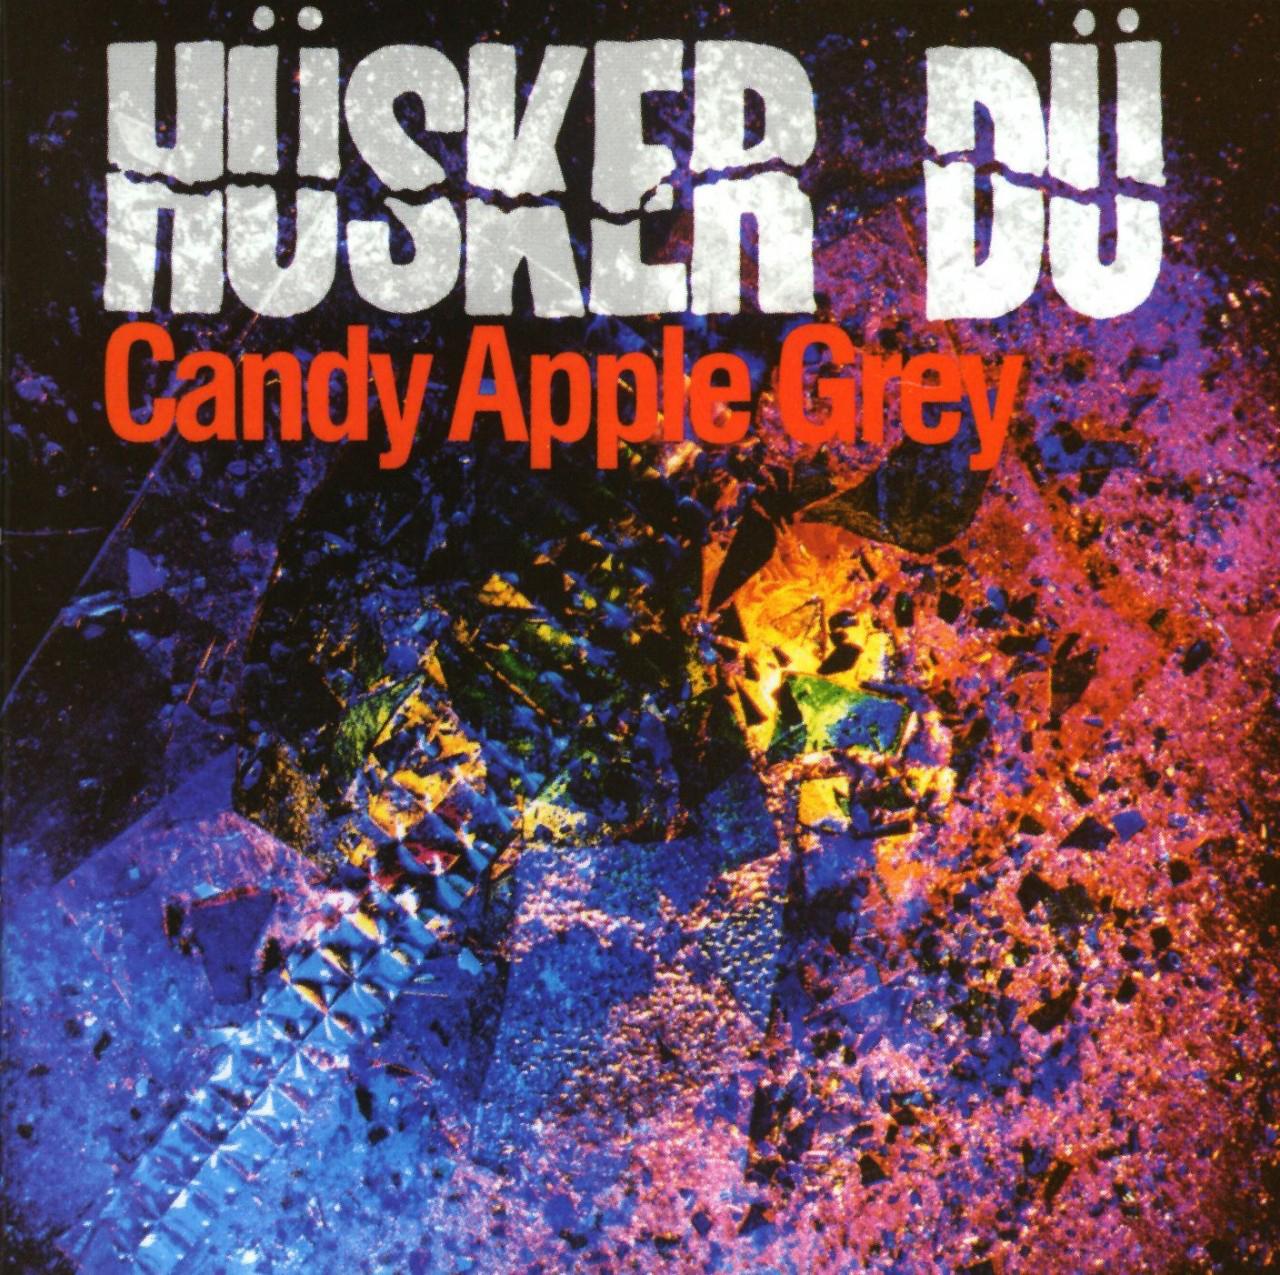 Hüsker Dü – Candy Apple Grey (Warner Bros., 1986). Cover photo by Daniel Corrigan.